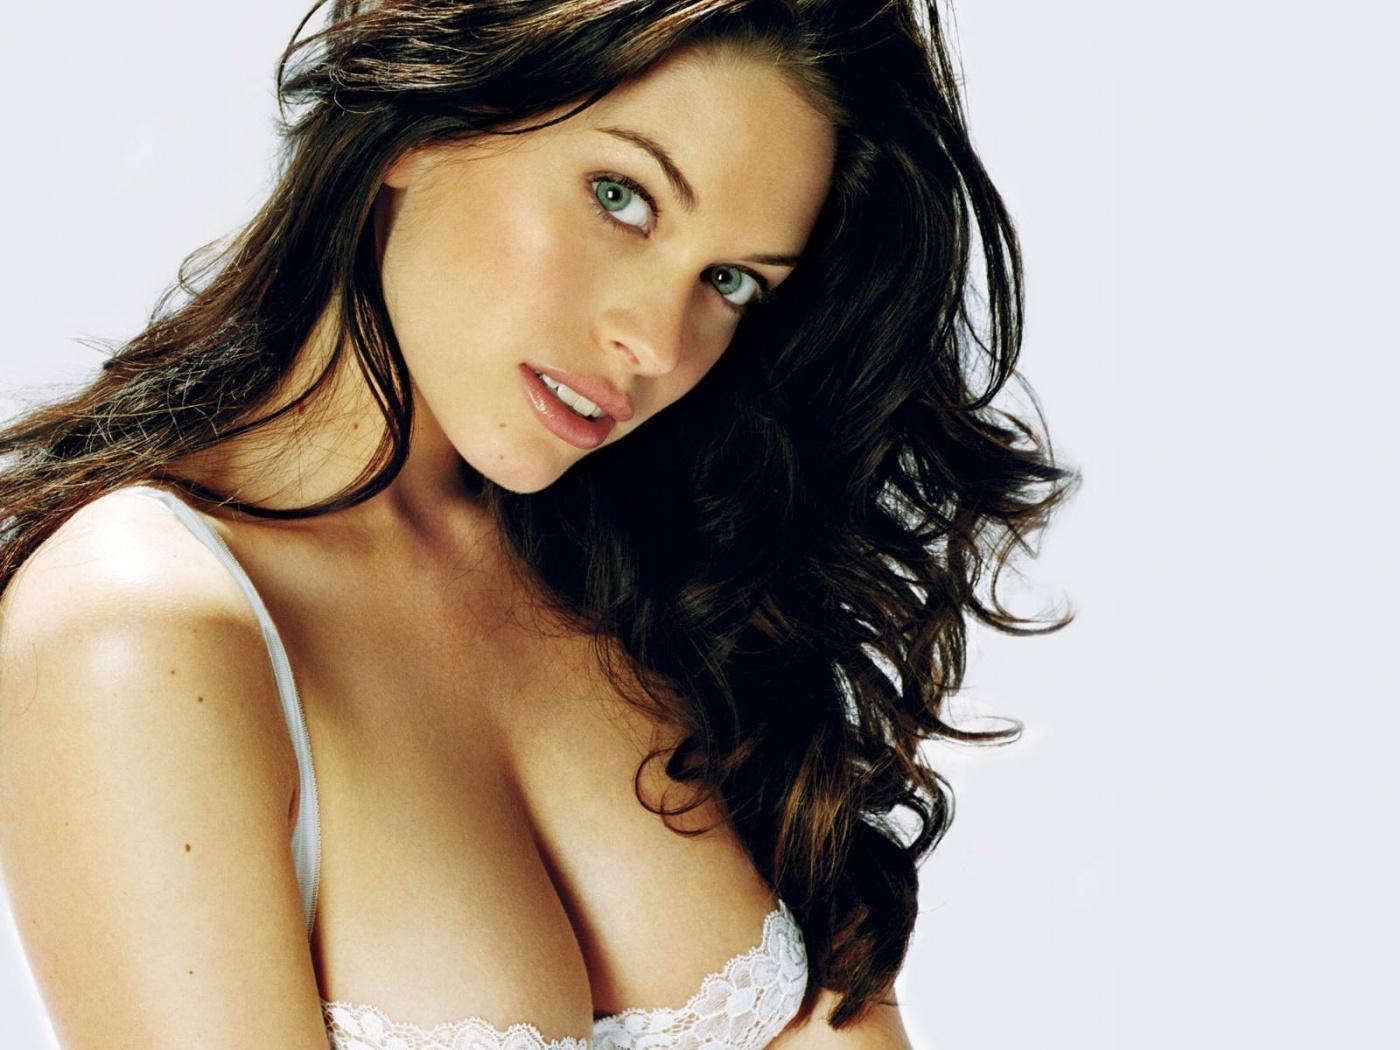 http://2.bp.blogspot.com/_7kW7FQsYN2w/TUy_Z2Ako4I/AAAAAAAAARg/MWBUB3D_ffU/s1600/hot_sexy_bikini_brunette-1400x1050.jpg